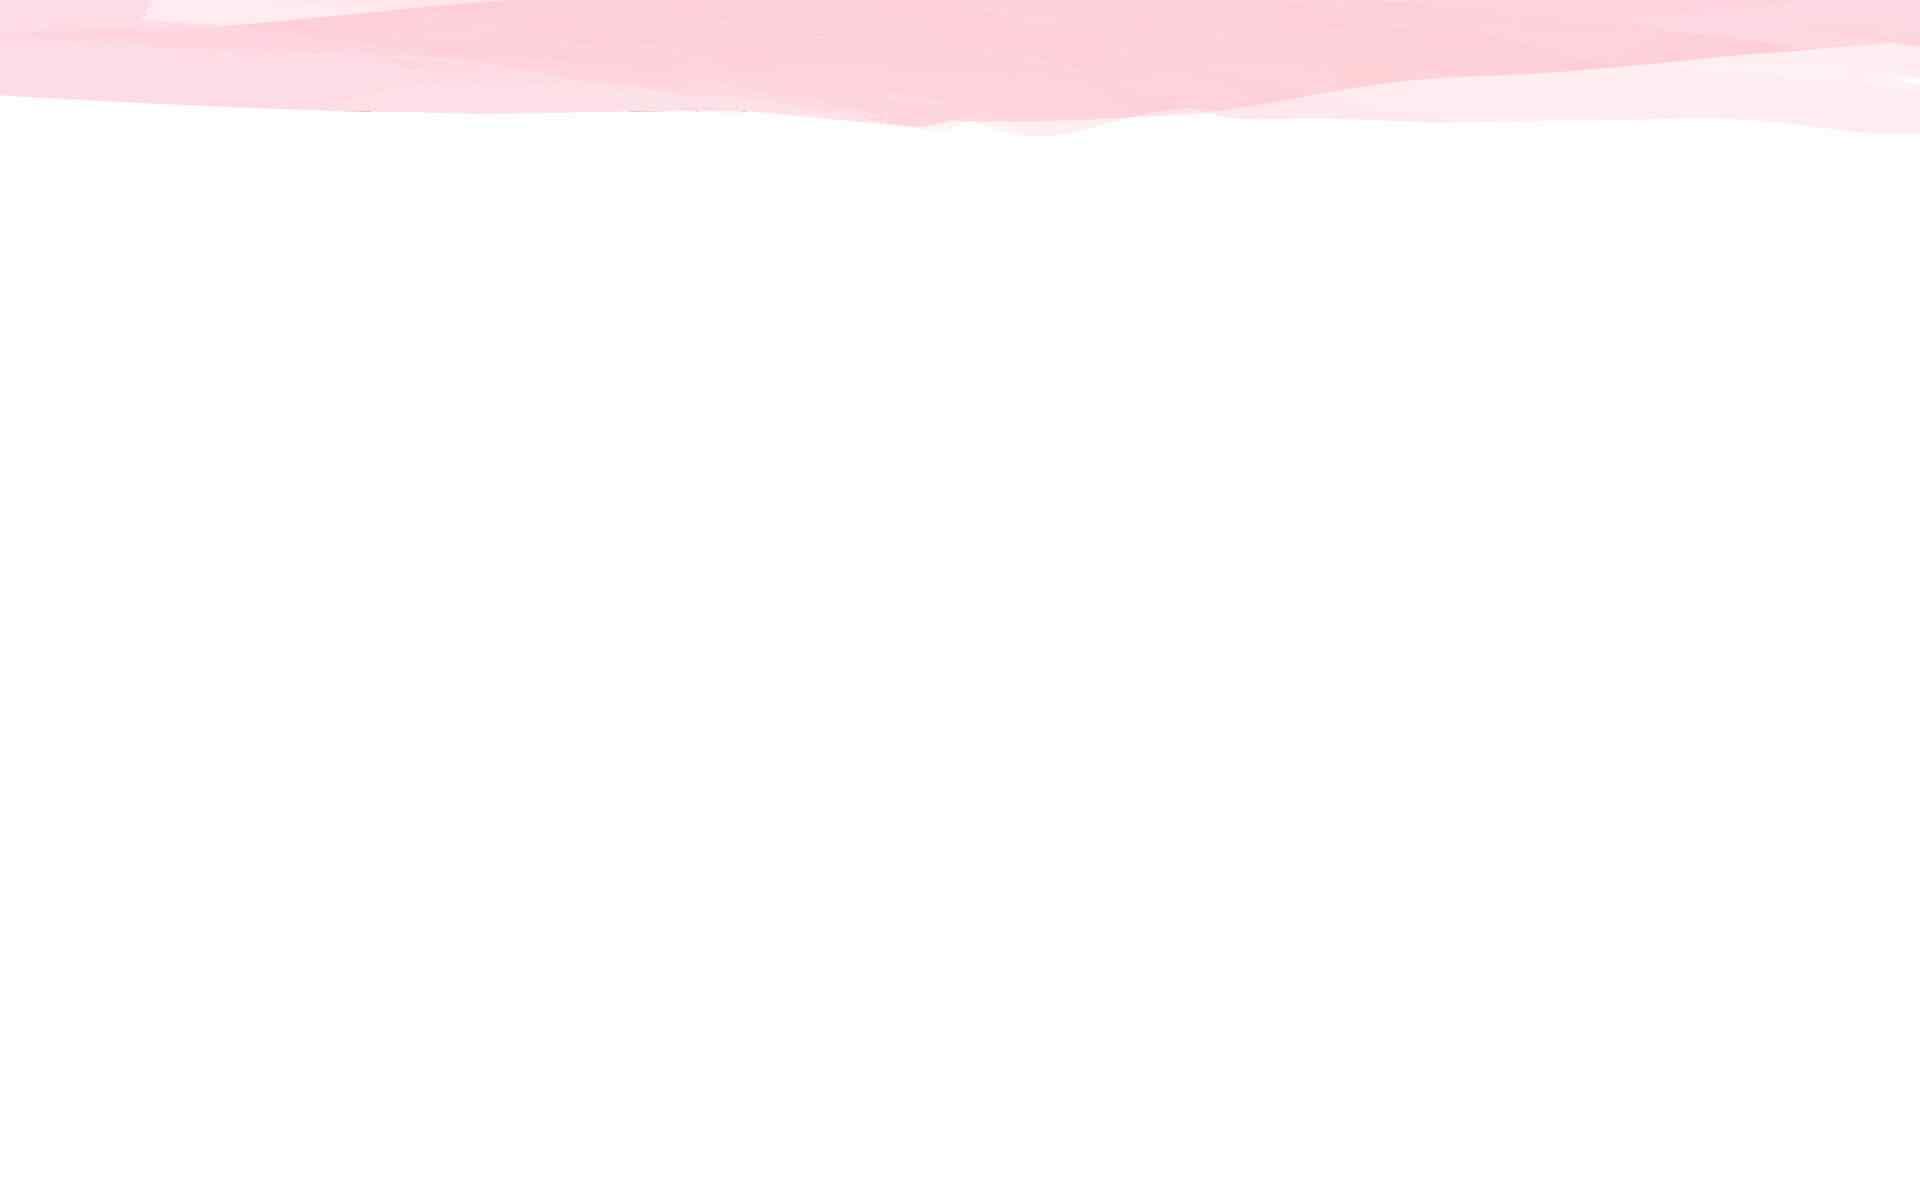 http://www.natalnakarta.online/wp-content/uploads/2018/02/pink_light_background.jpg